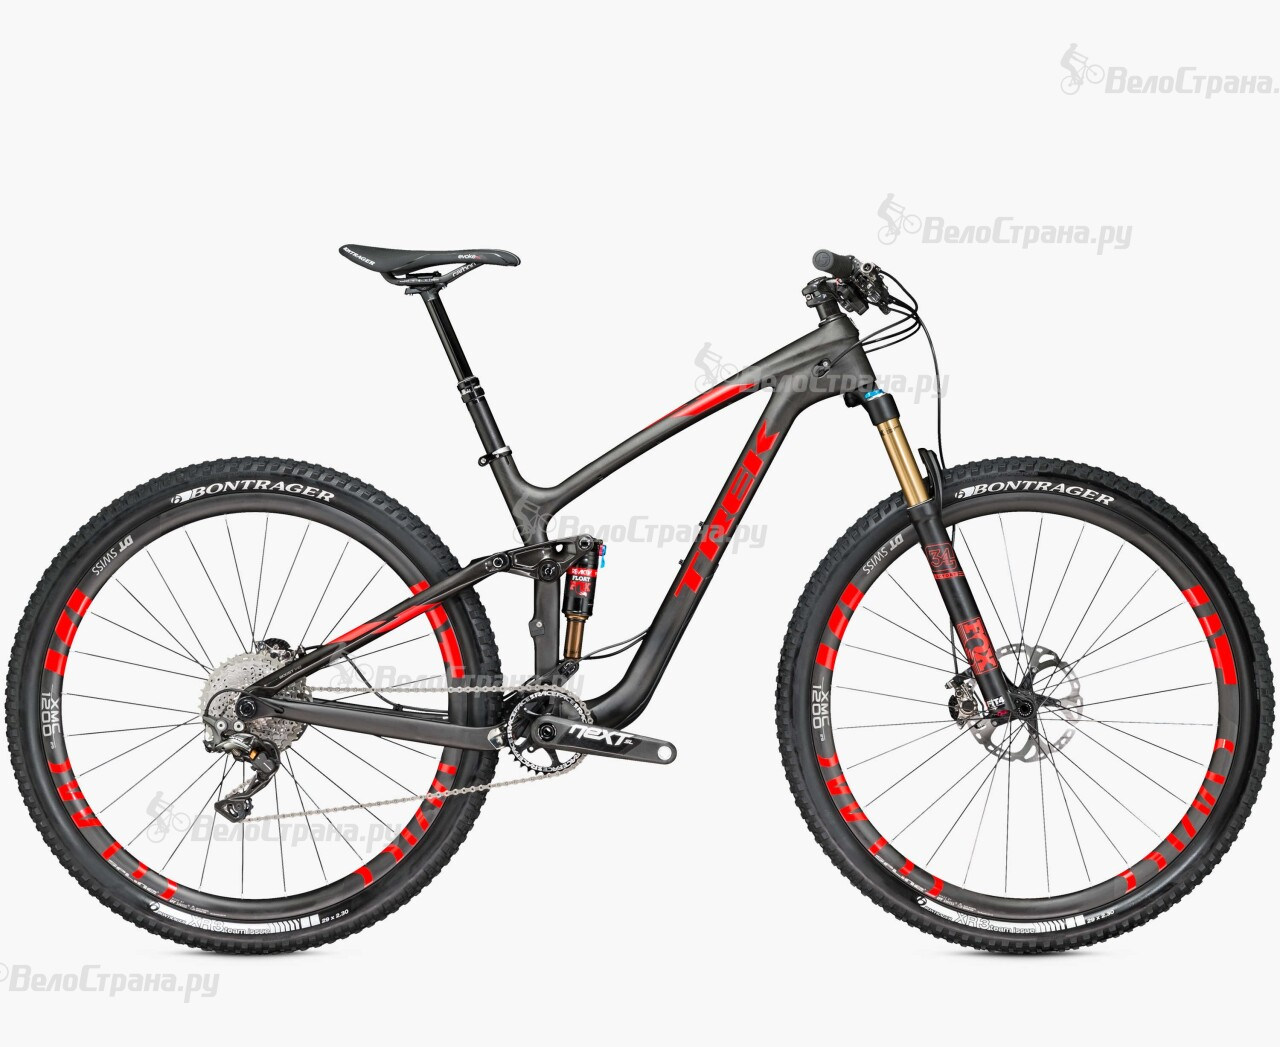 Велосипед Trek Fuel EX 9.9 29 (2016) велосипед trek fuel ex 9 29 2017